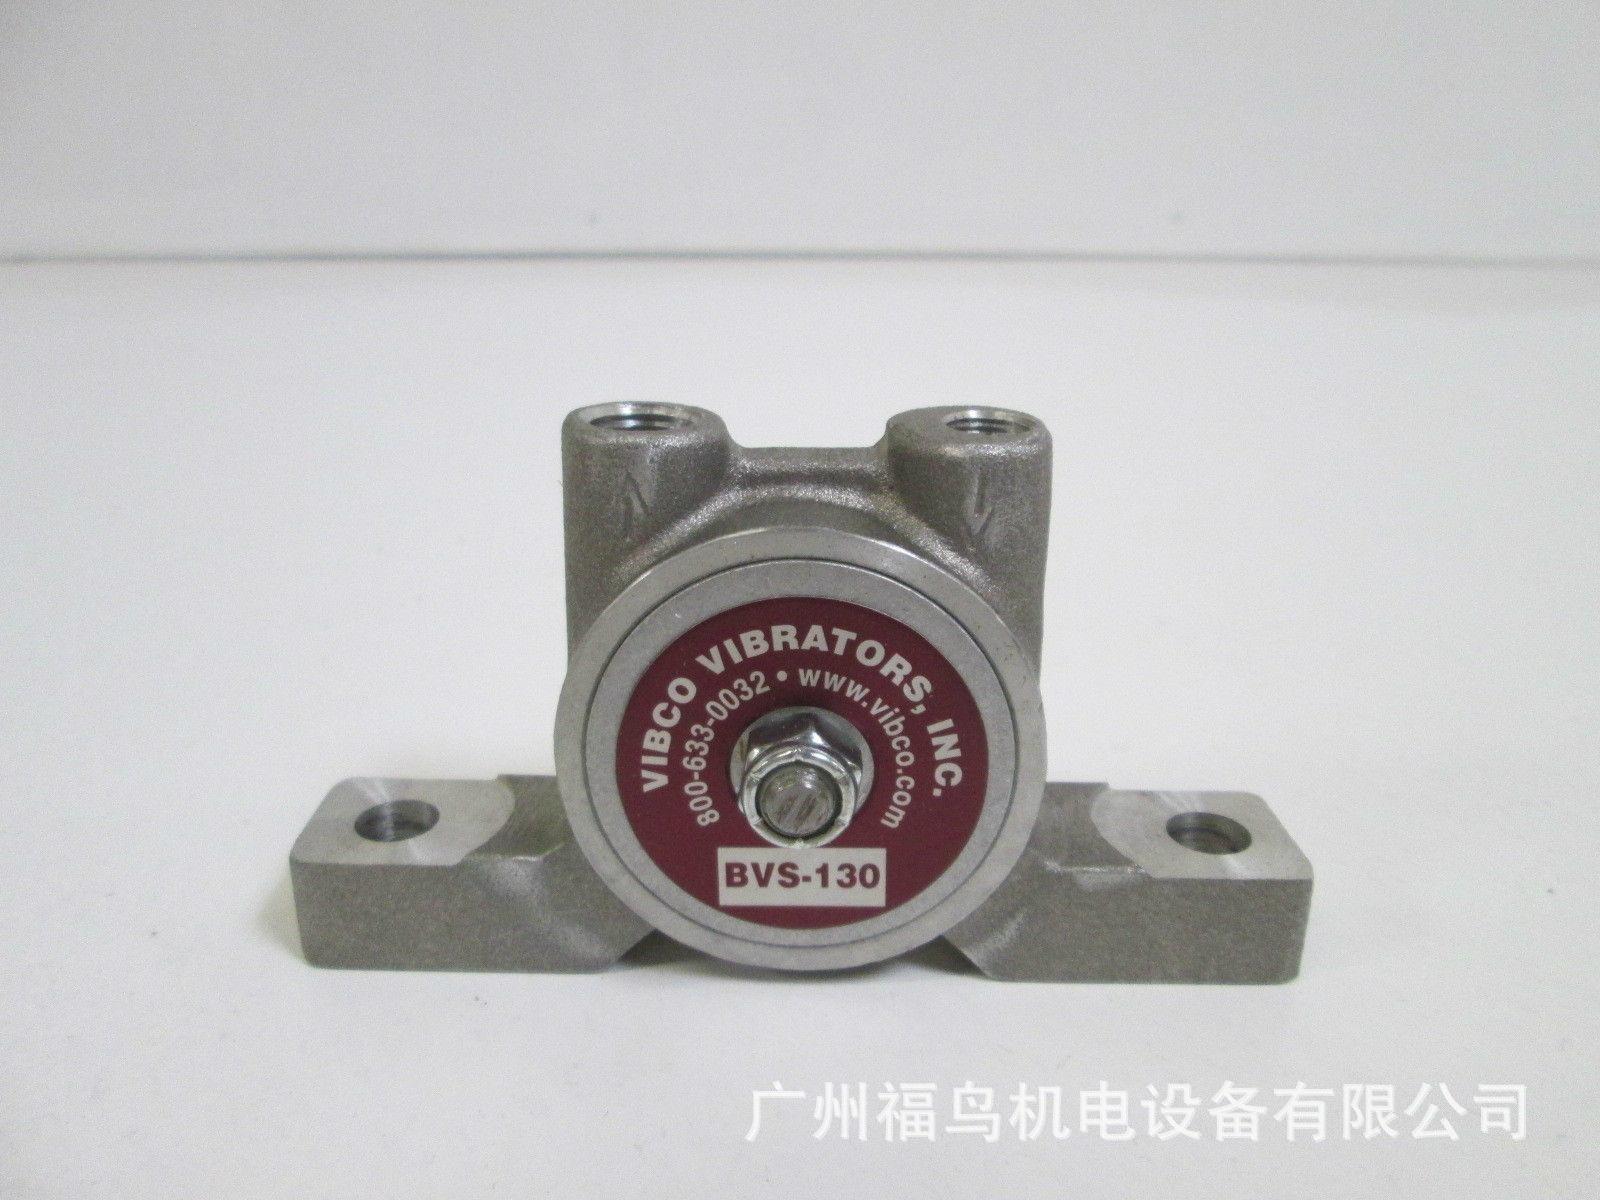 VIBCO振动器, 型号: BVS-130